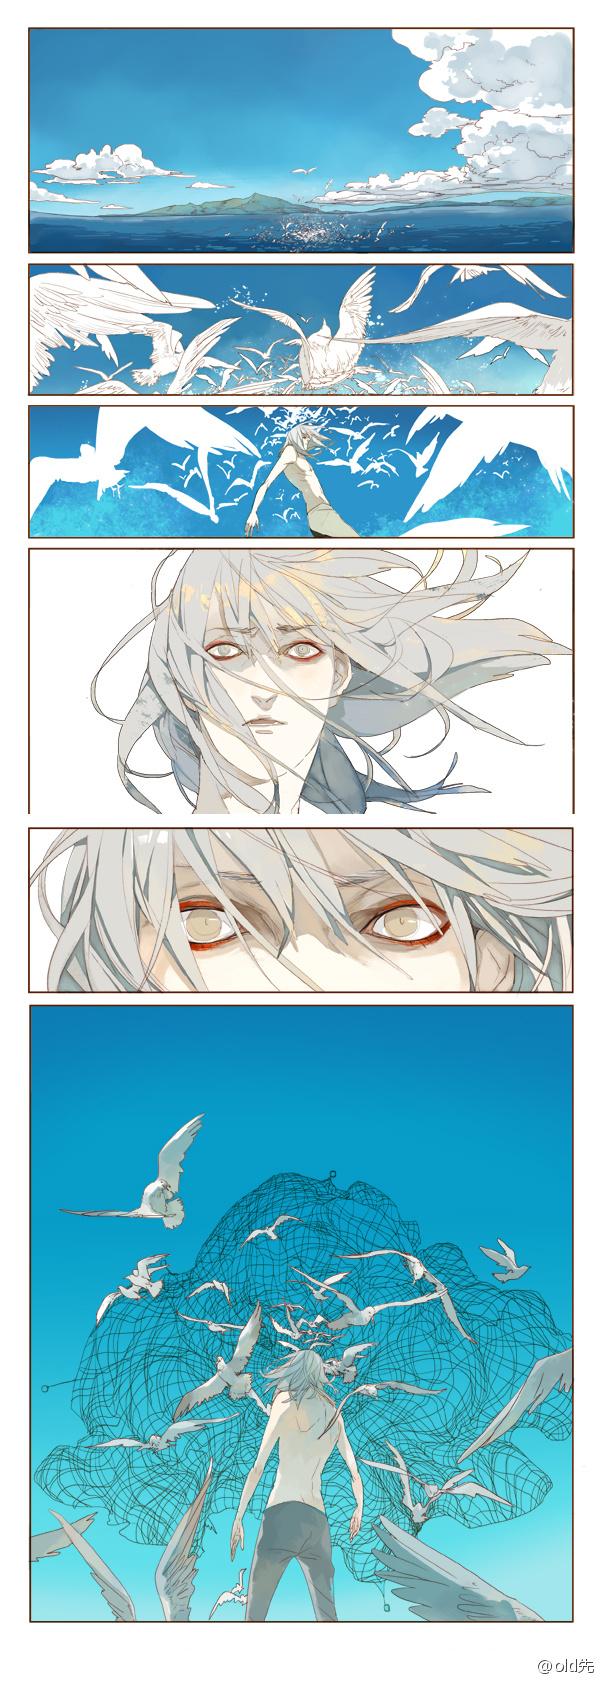 Tags: Anime, Oldxian, Heat of Love, Seagull, Island